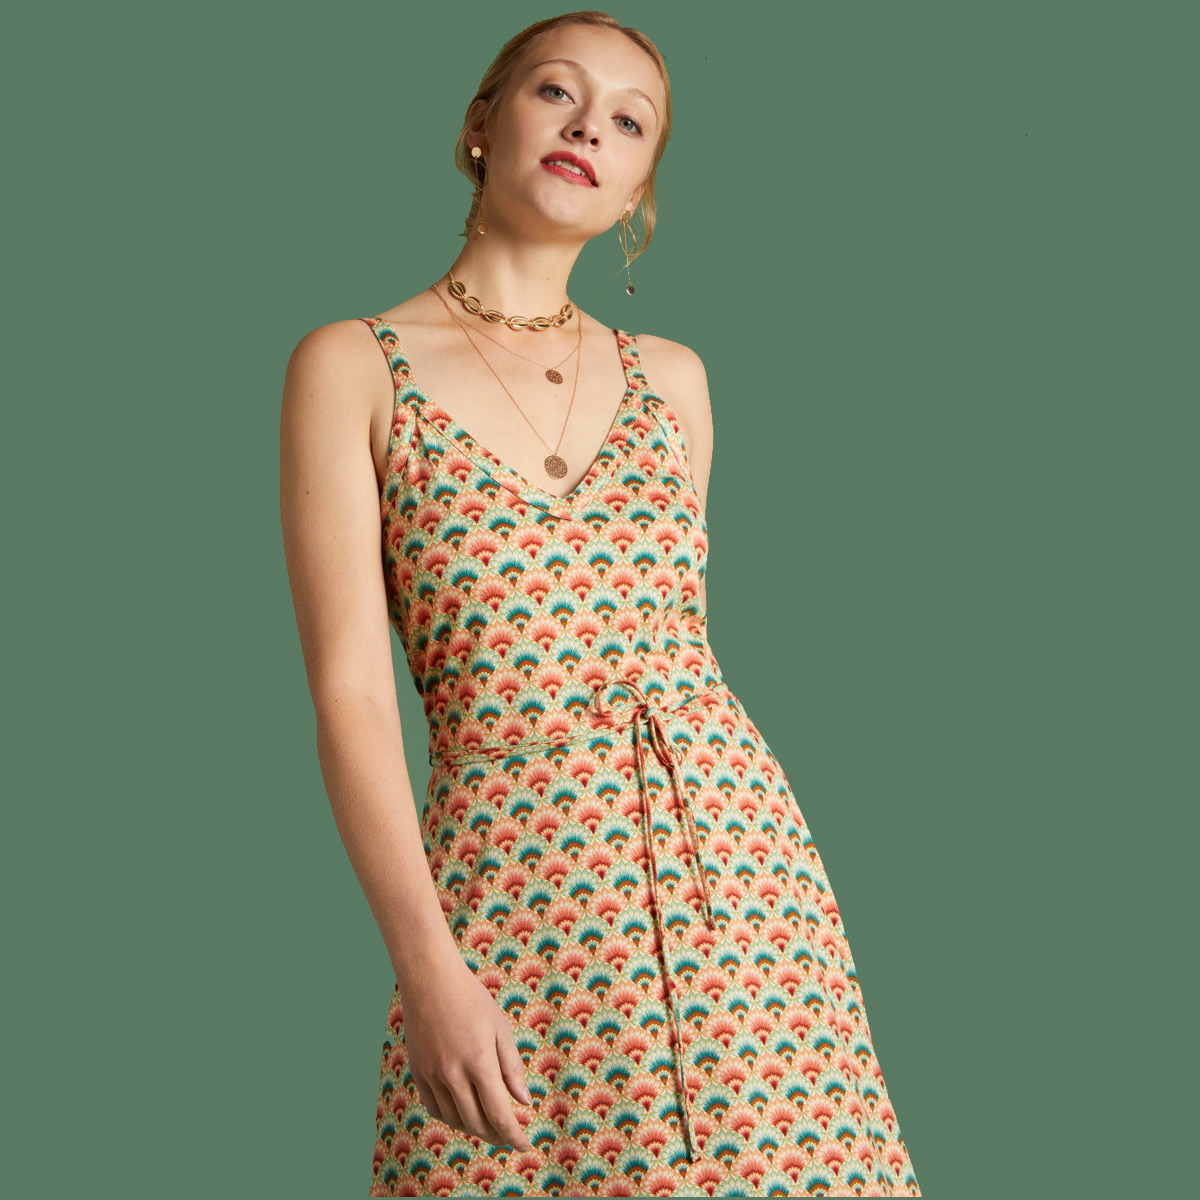 King Louie Kleid Isa Dress Carmel, Farbe Pearly Dew   Grösse M